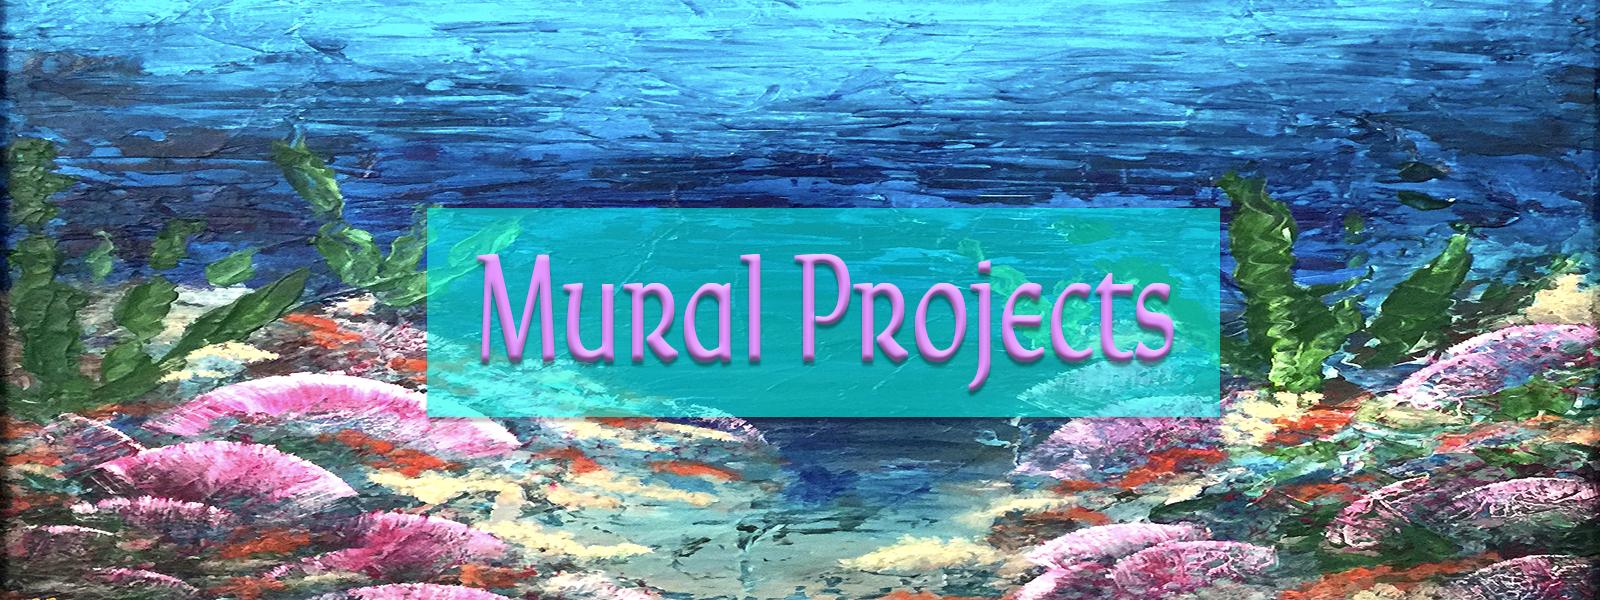 KJ's Art Studio ~ KJsArtStudio.com | Mural Art, Mural Projects, Mural Wall Art, Wall Murals, Commission Art, Commissions, KJ Burk